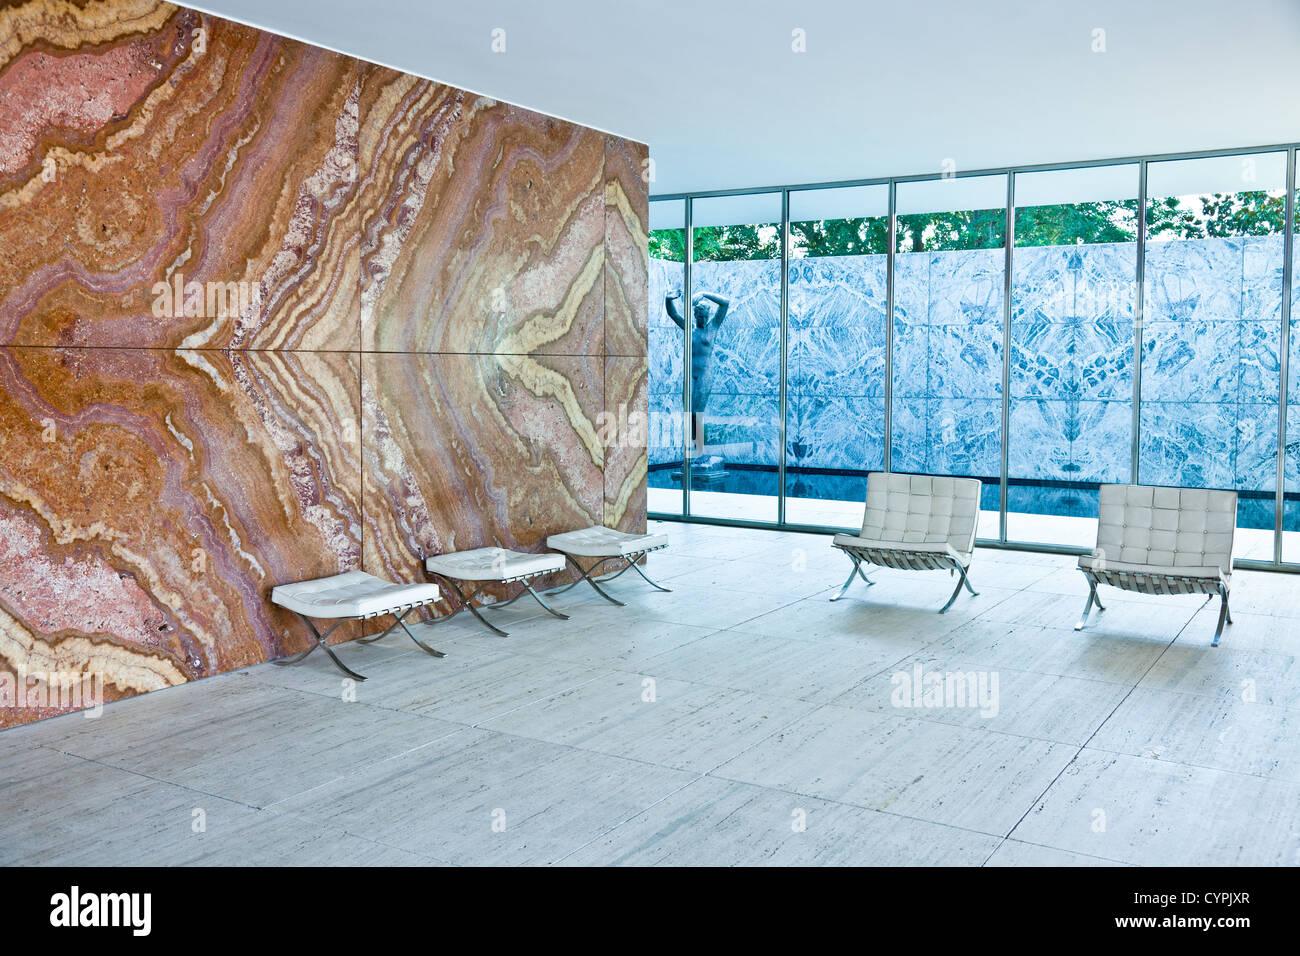 Barcelona Pavilion - Stock Image